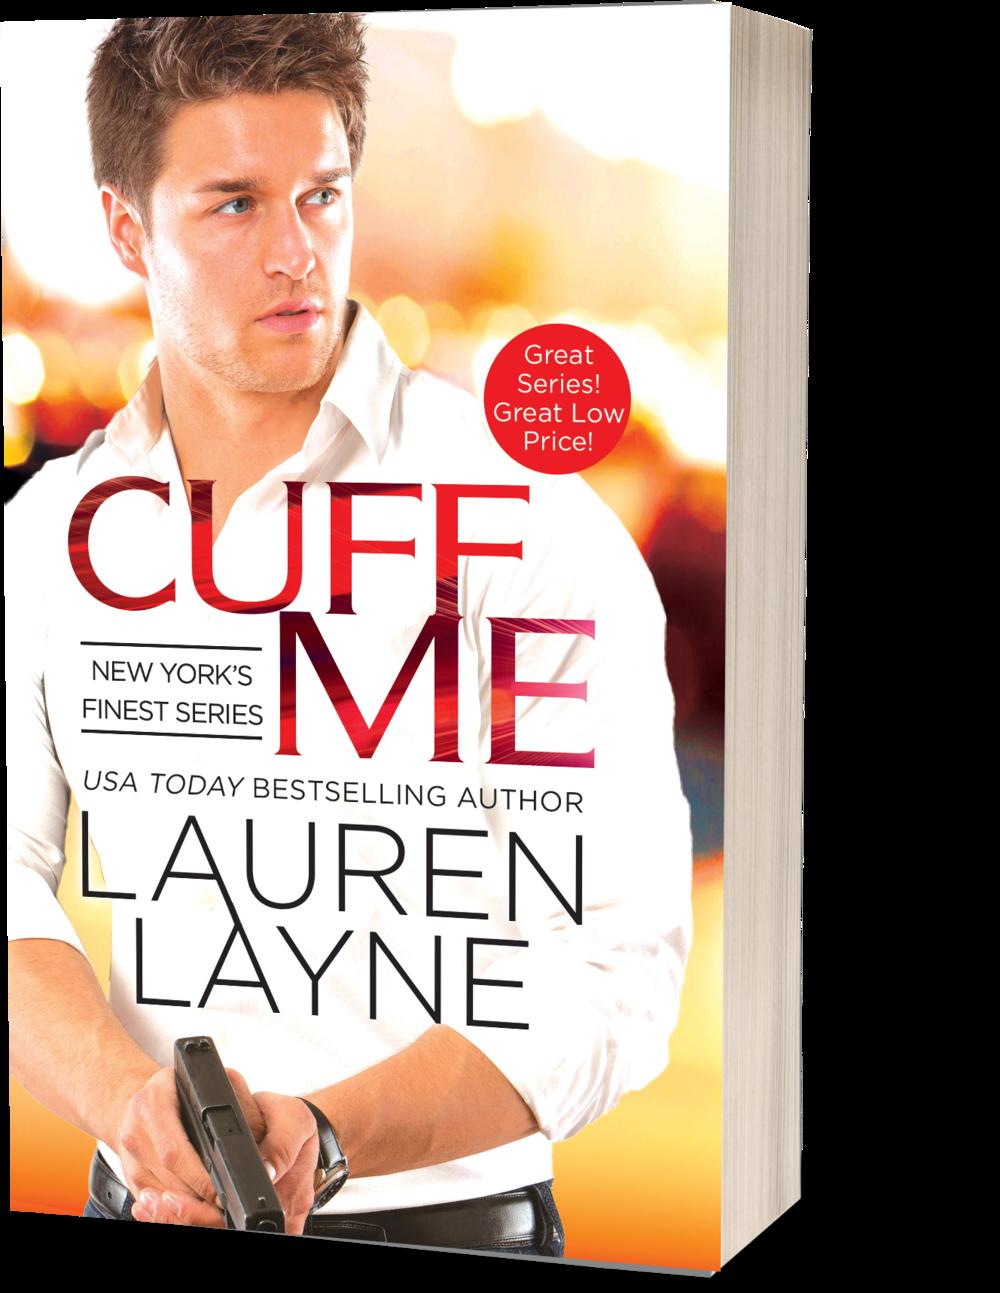 Cuff Me by Lauren Layne